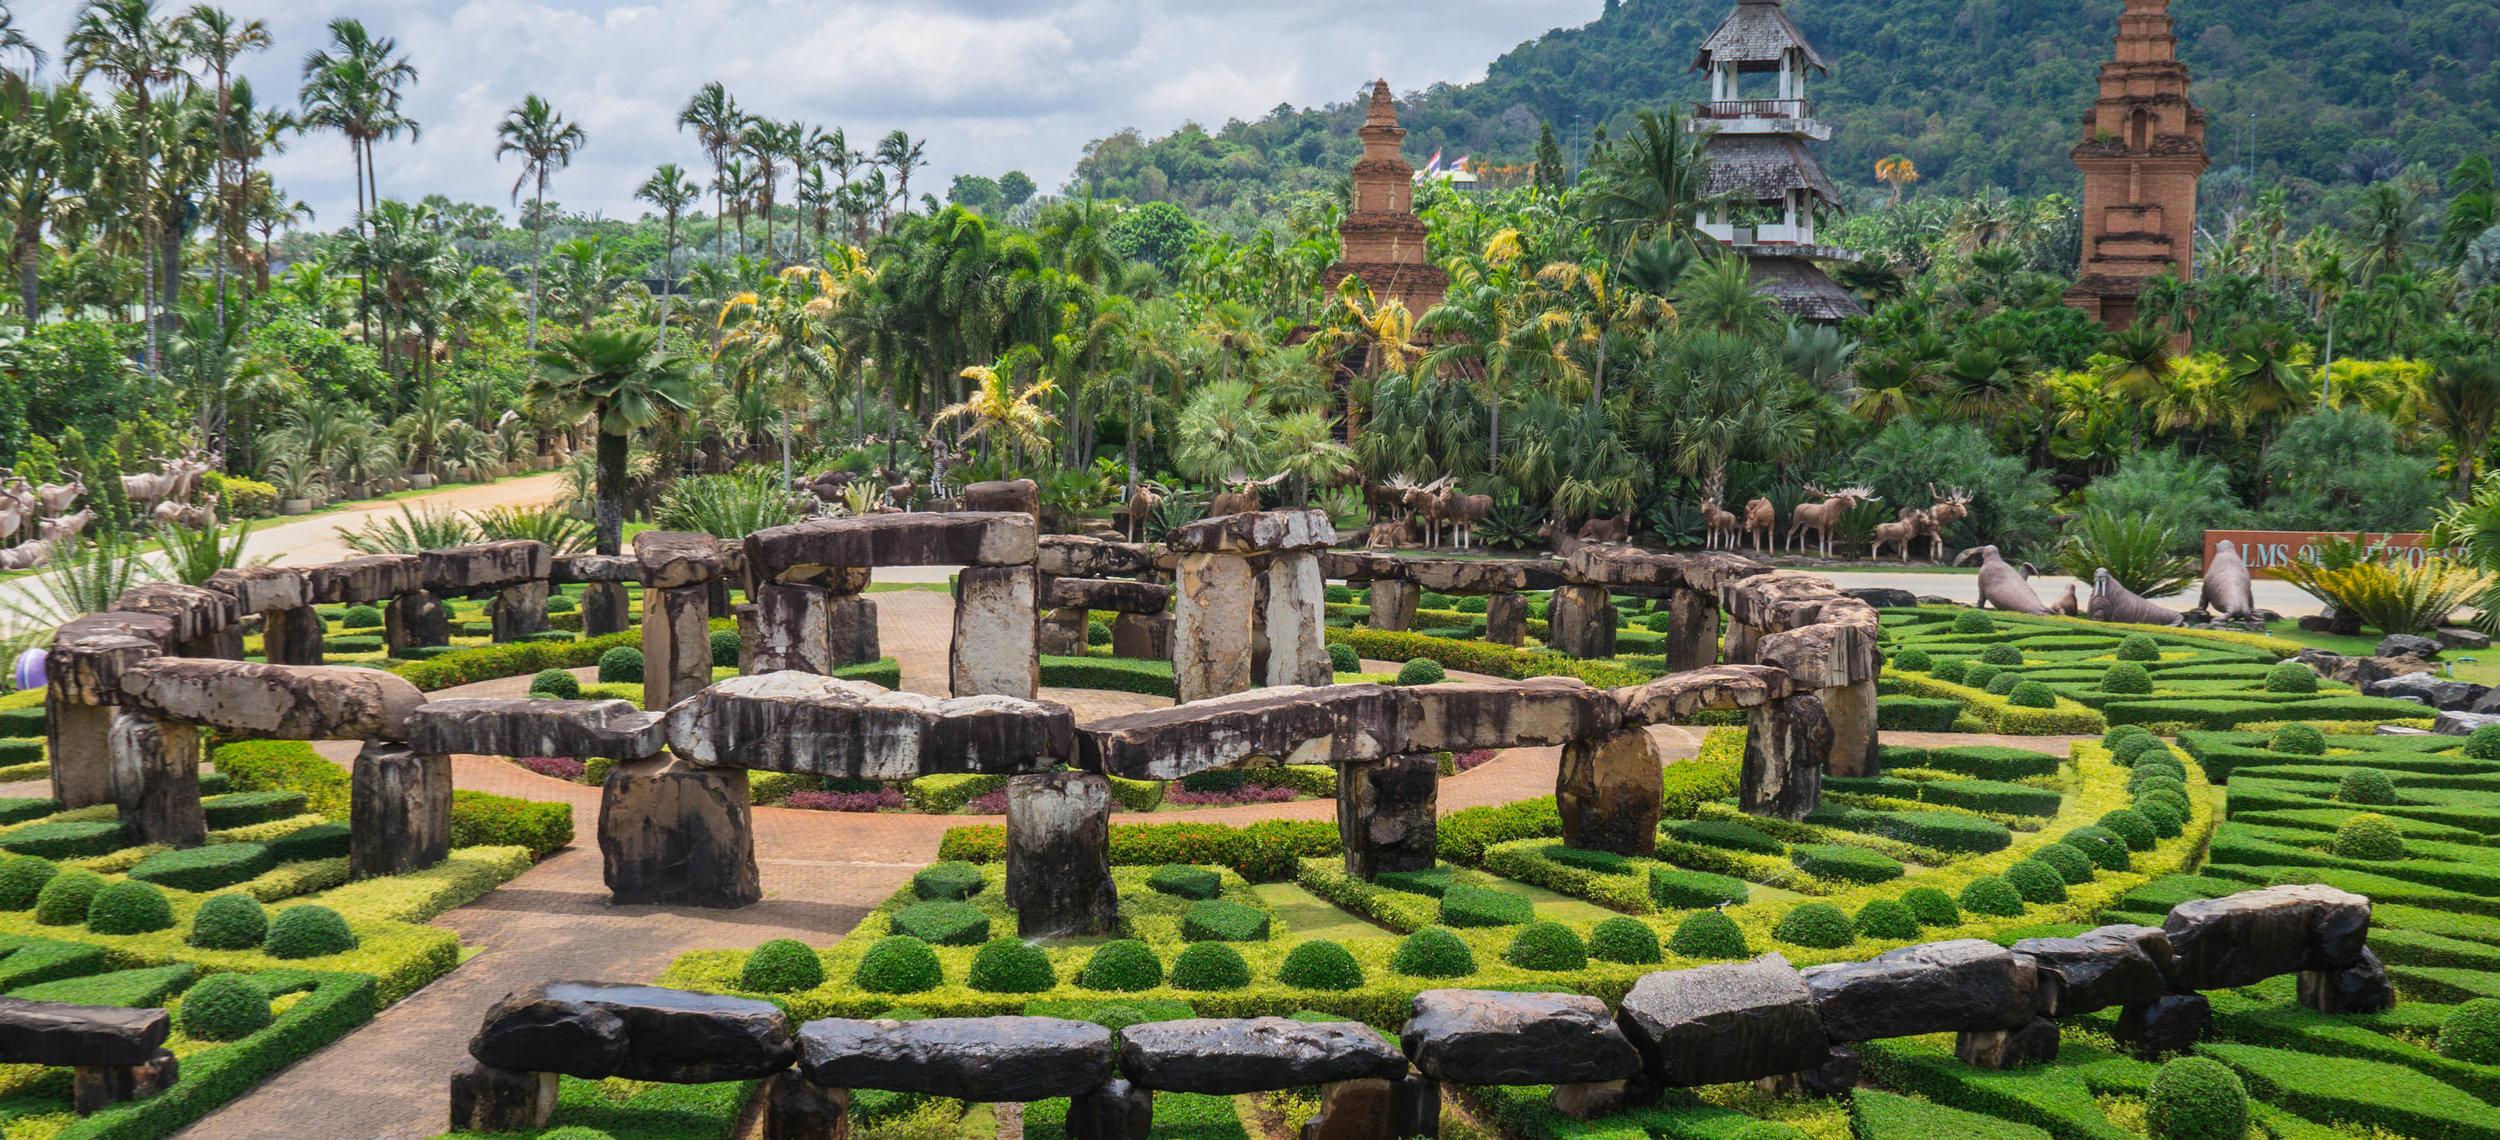 Nong Nooch tropical garden. Source: noonnochtropicalgarden.com